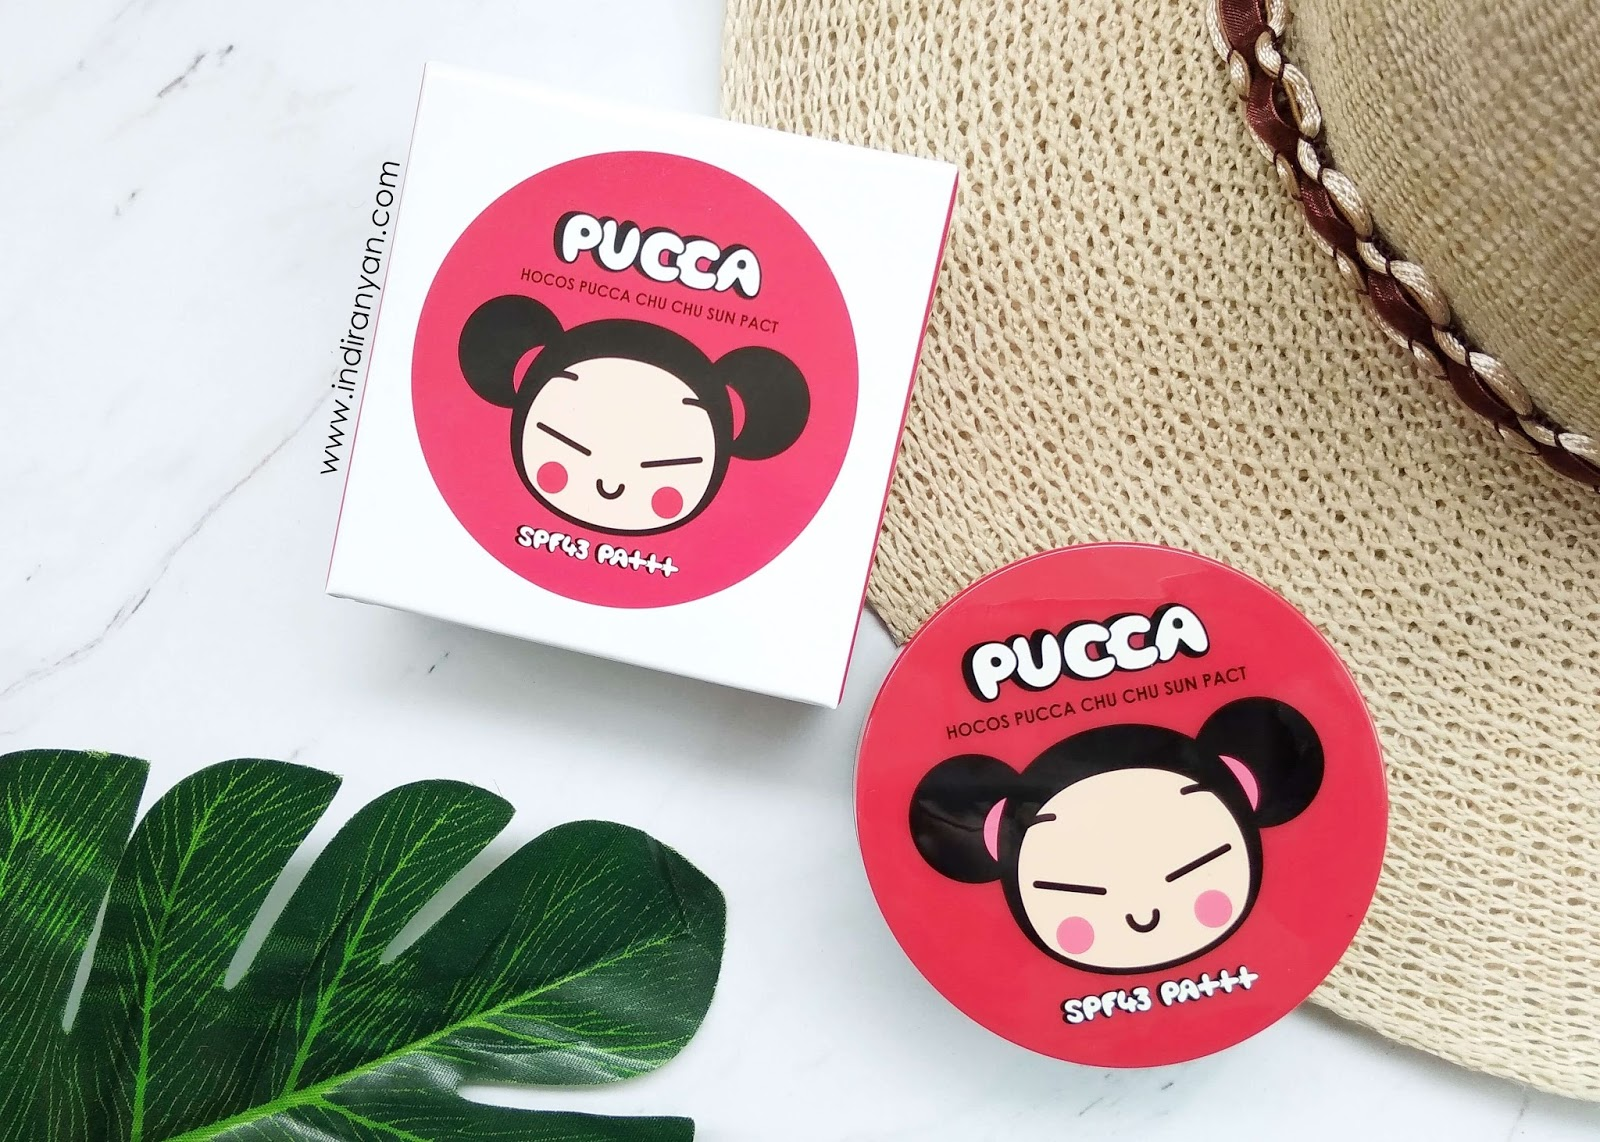 review-hocos-puccha, hocos-puccha-chu-chu-sunpact